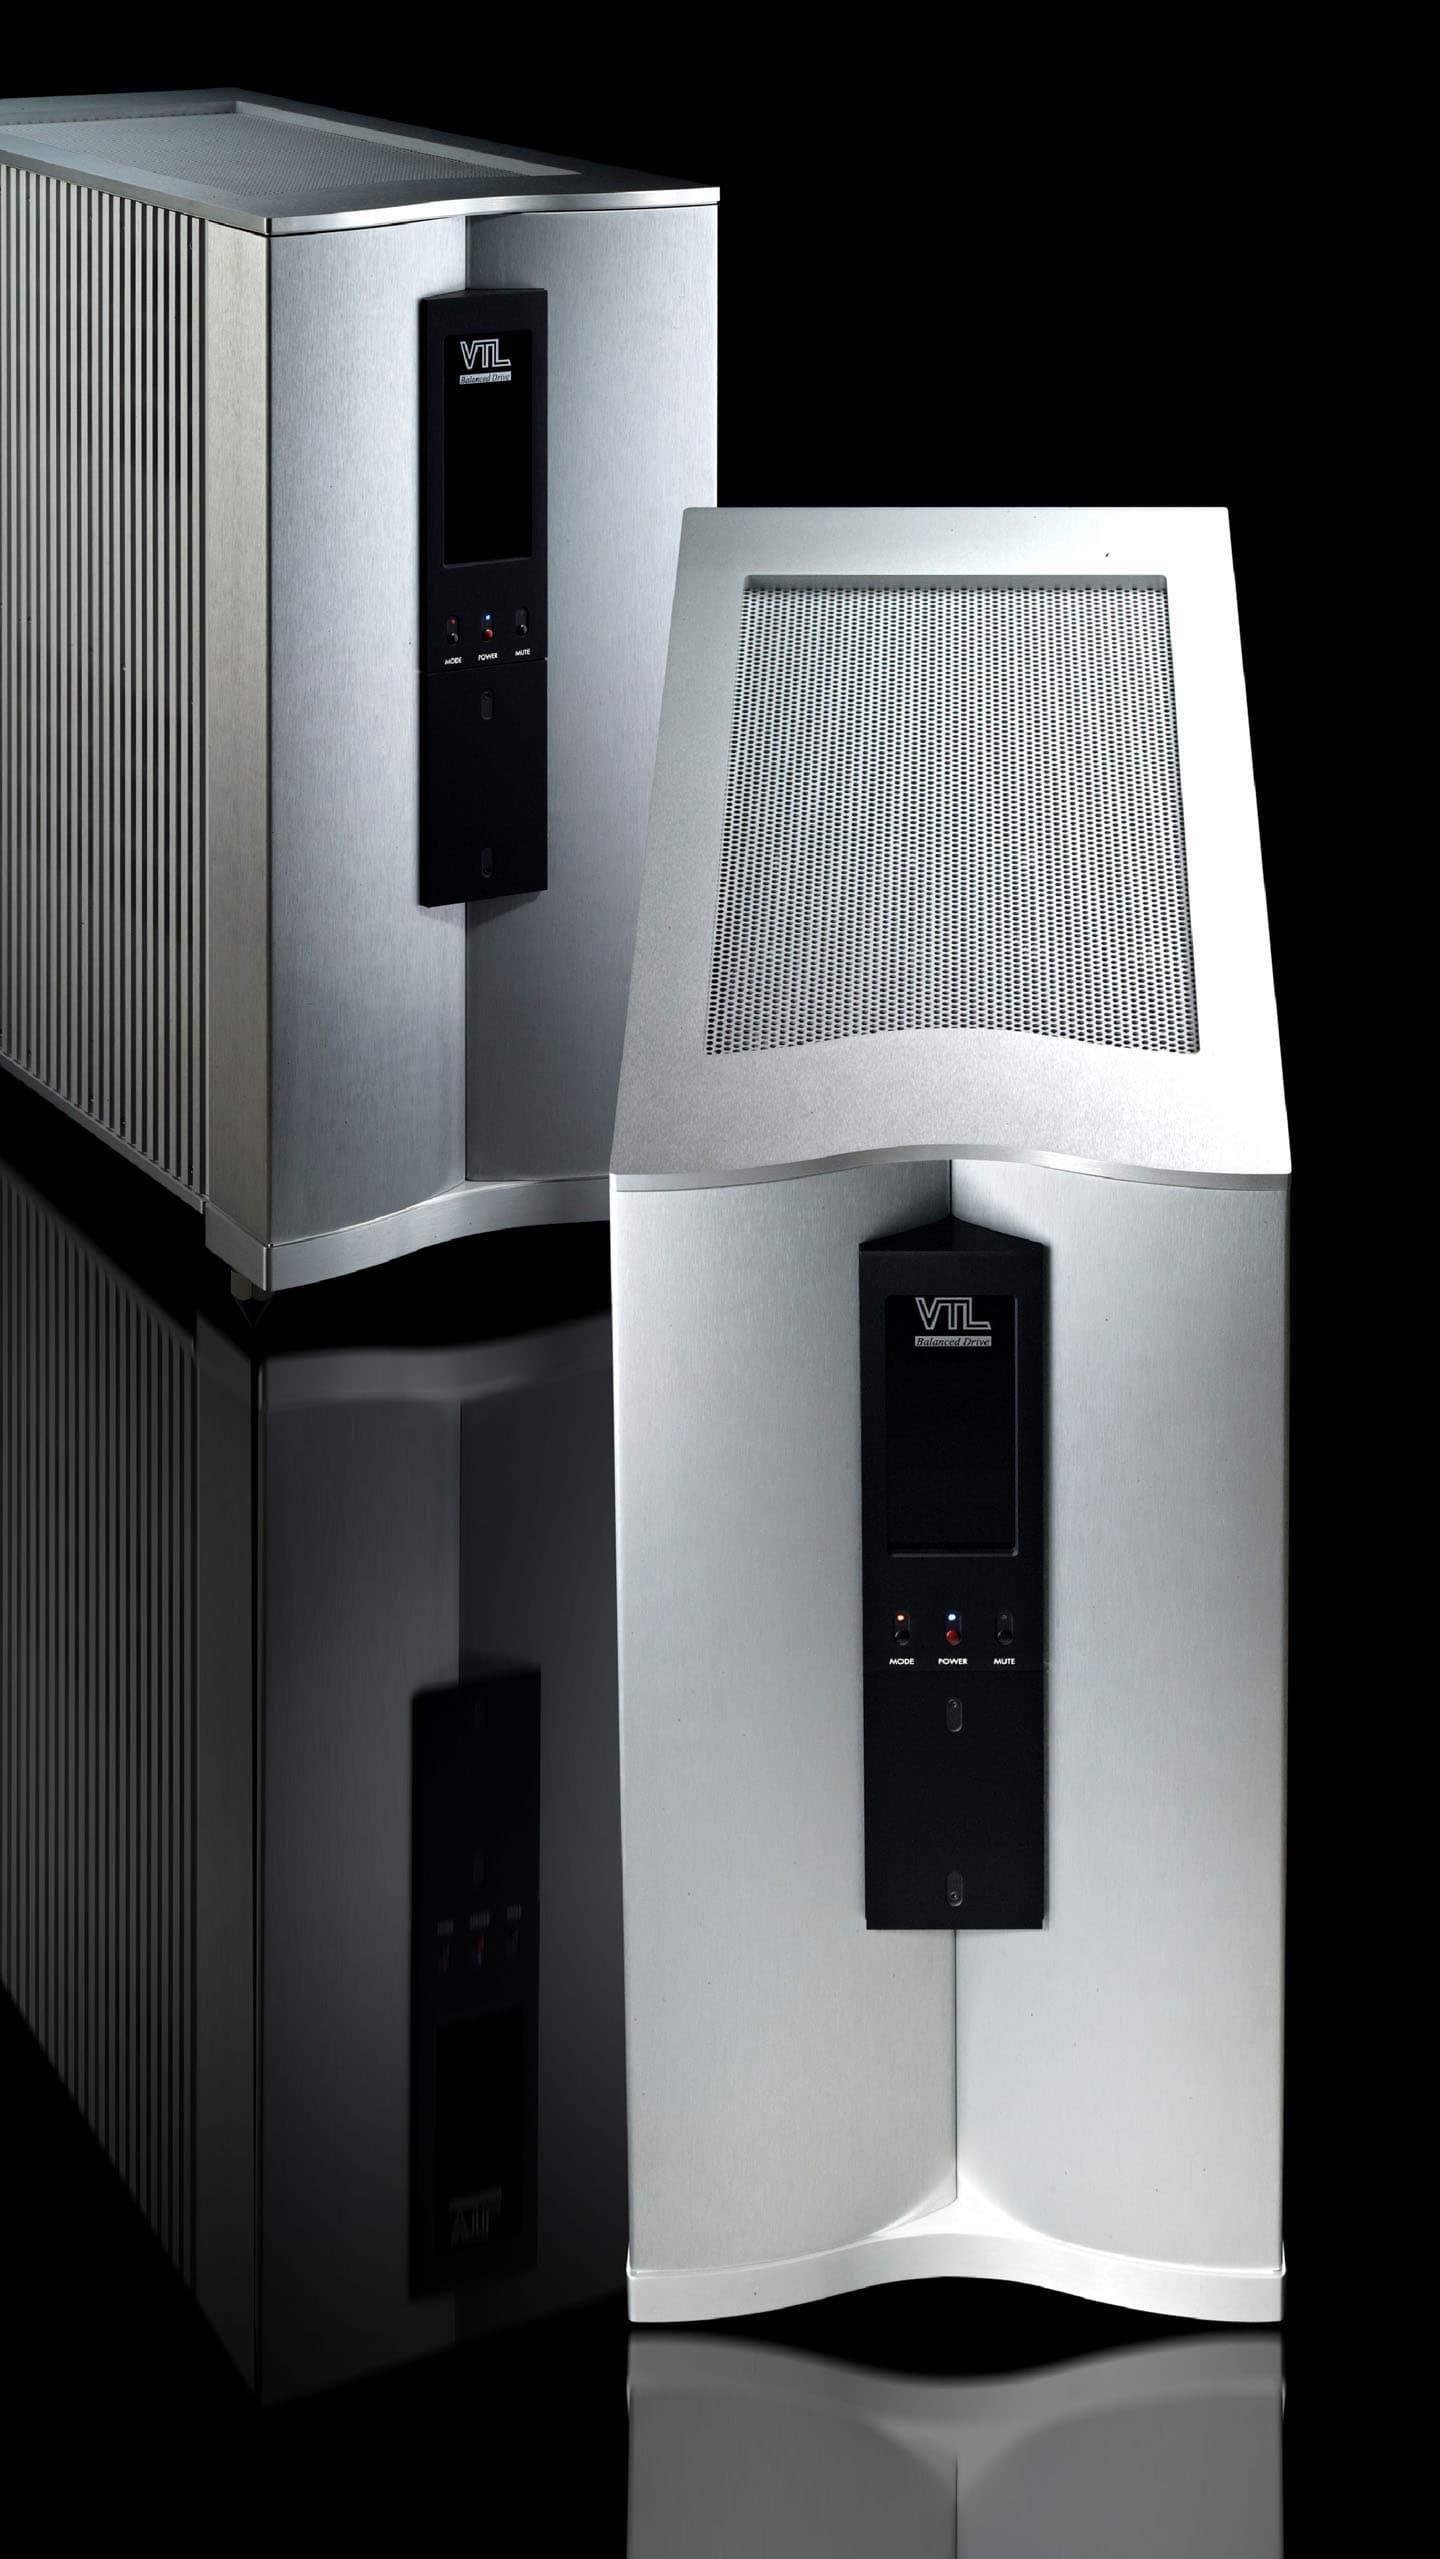 VTL Power amplifiers